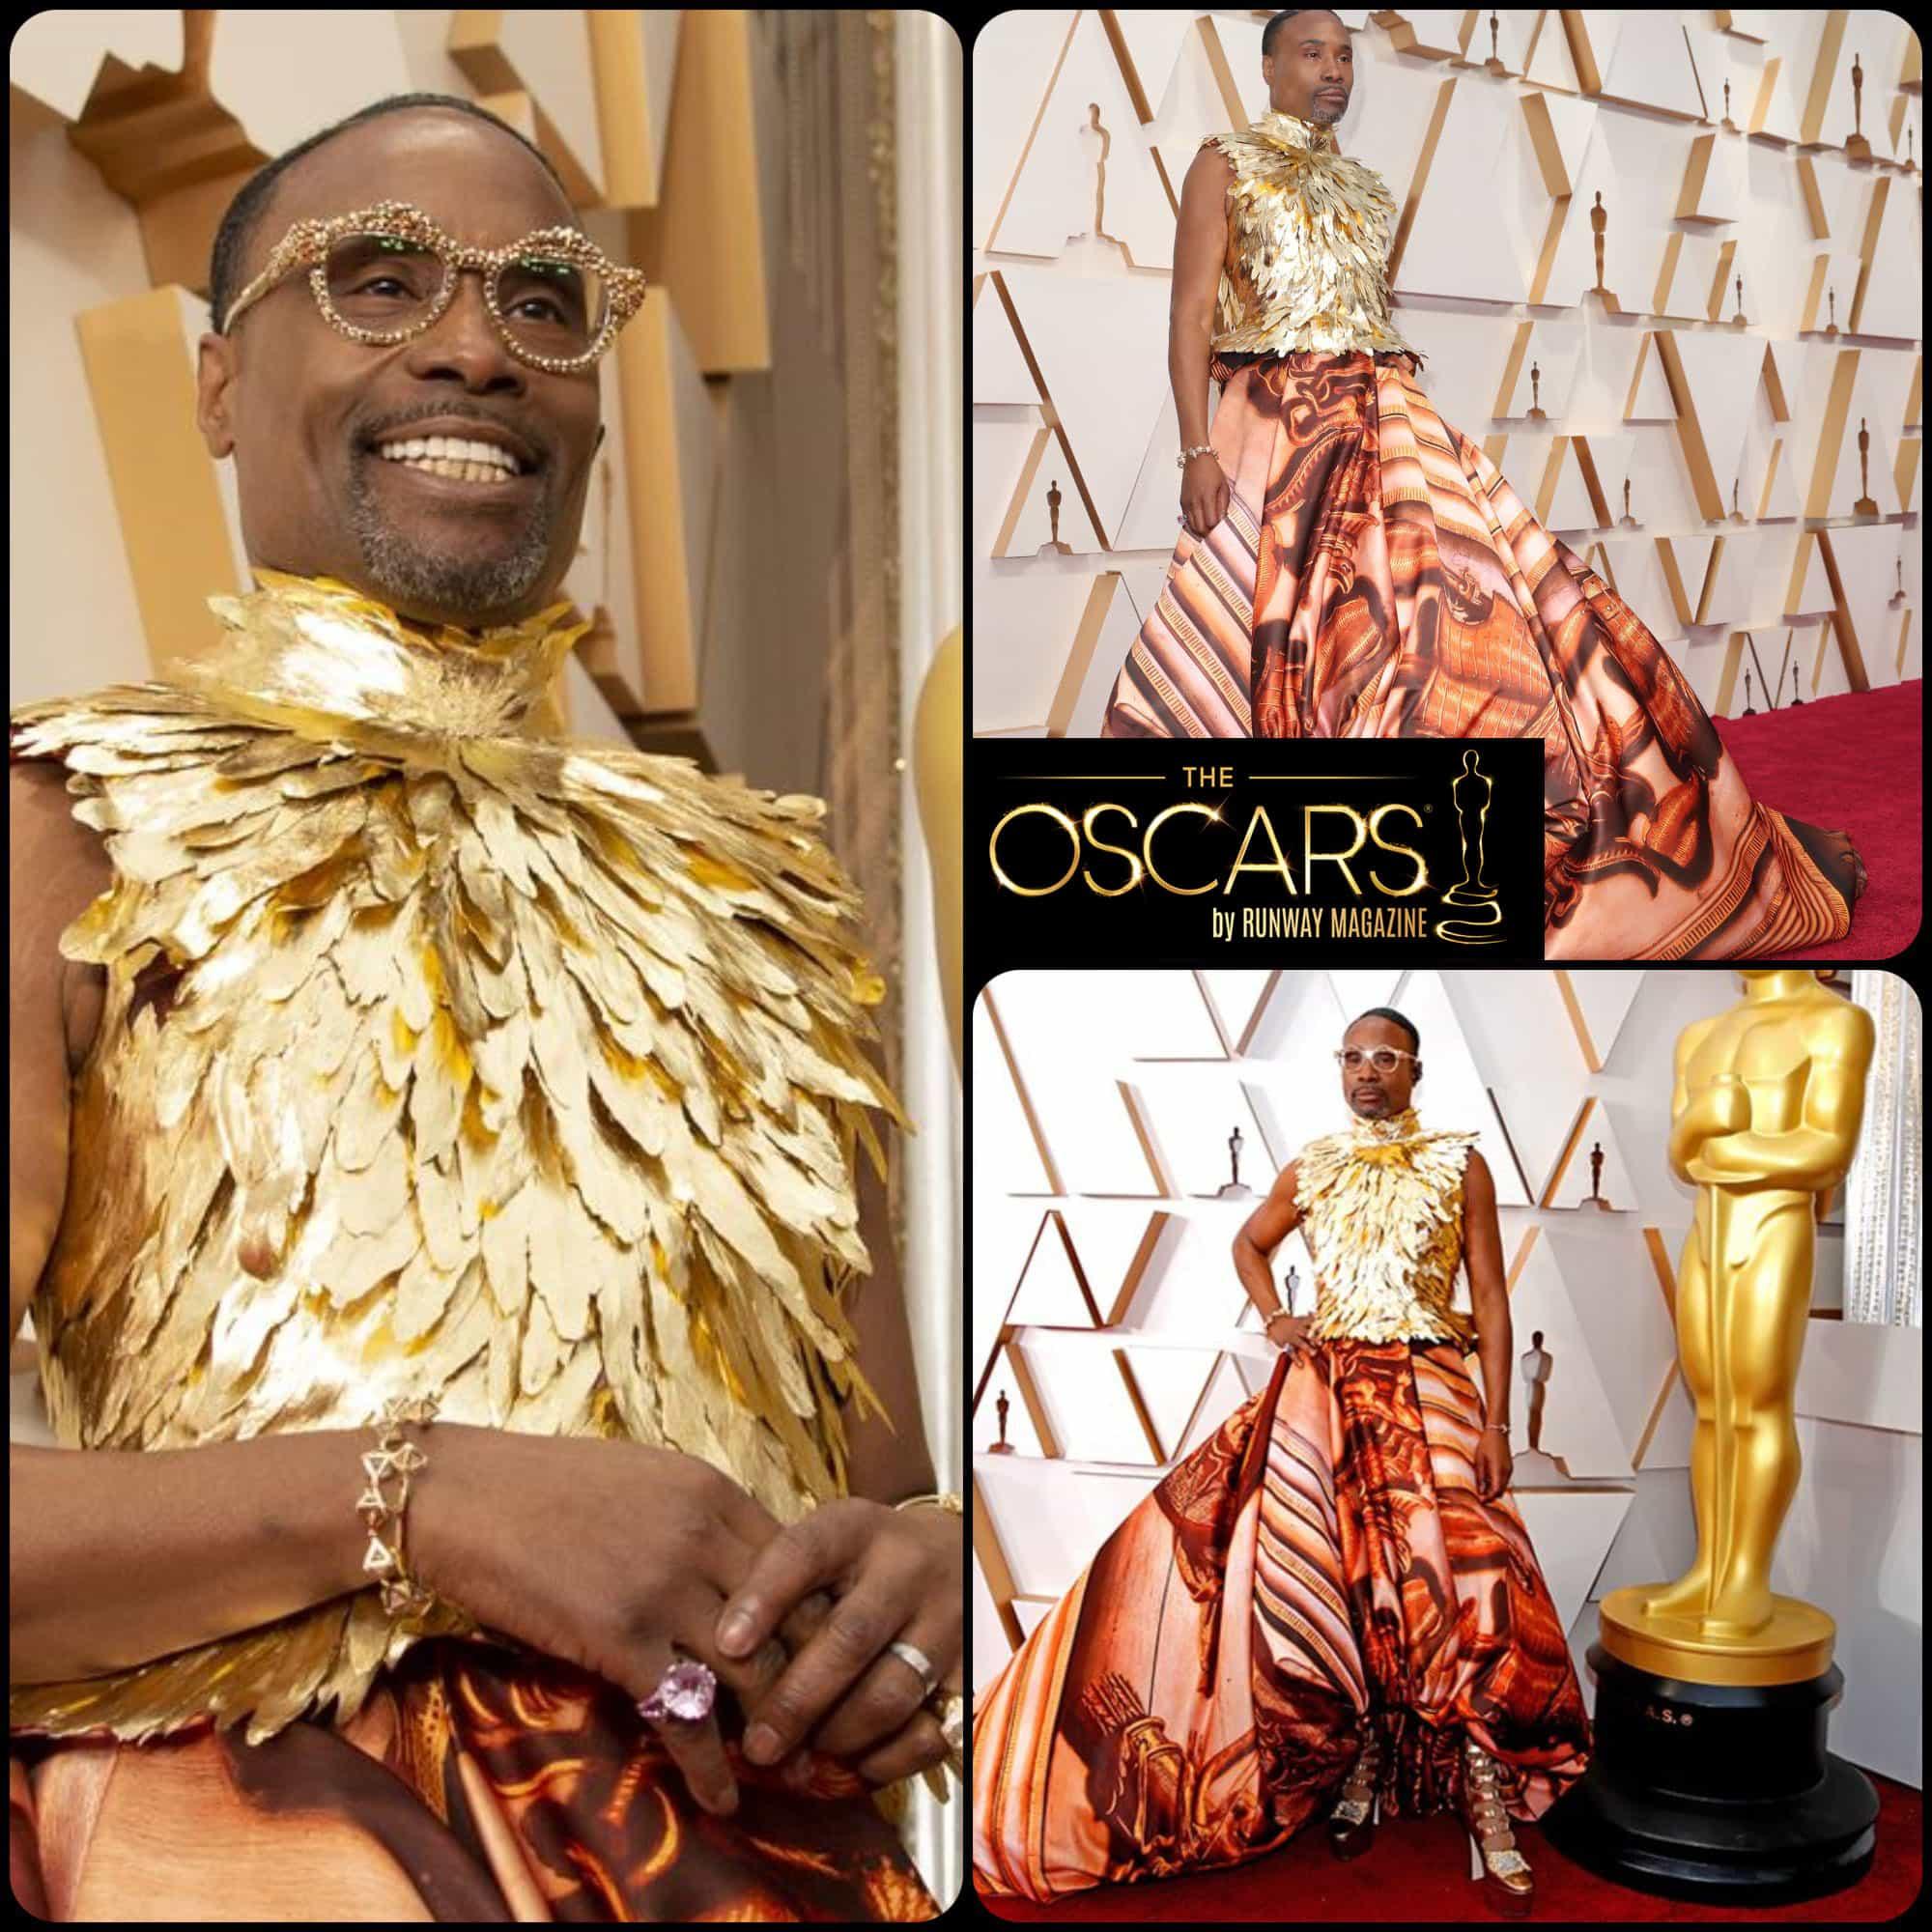 Oscars 2020 Billy Porter red carpet by RUNWAY MAGAZINE